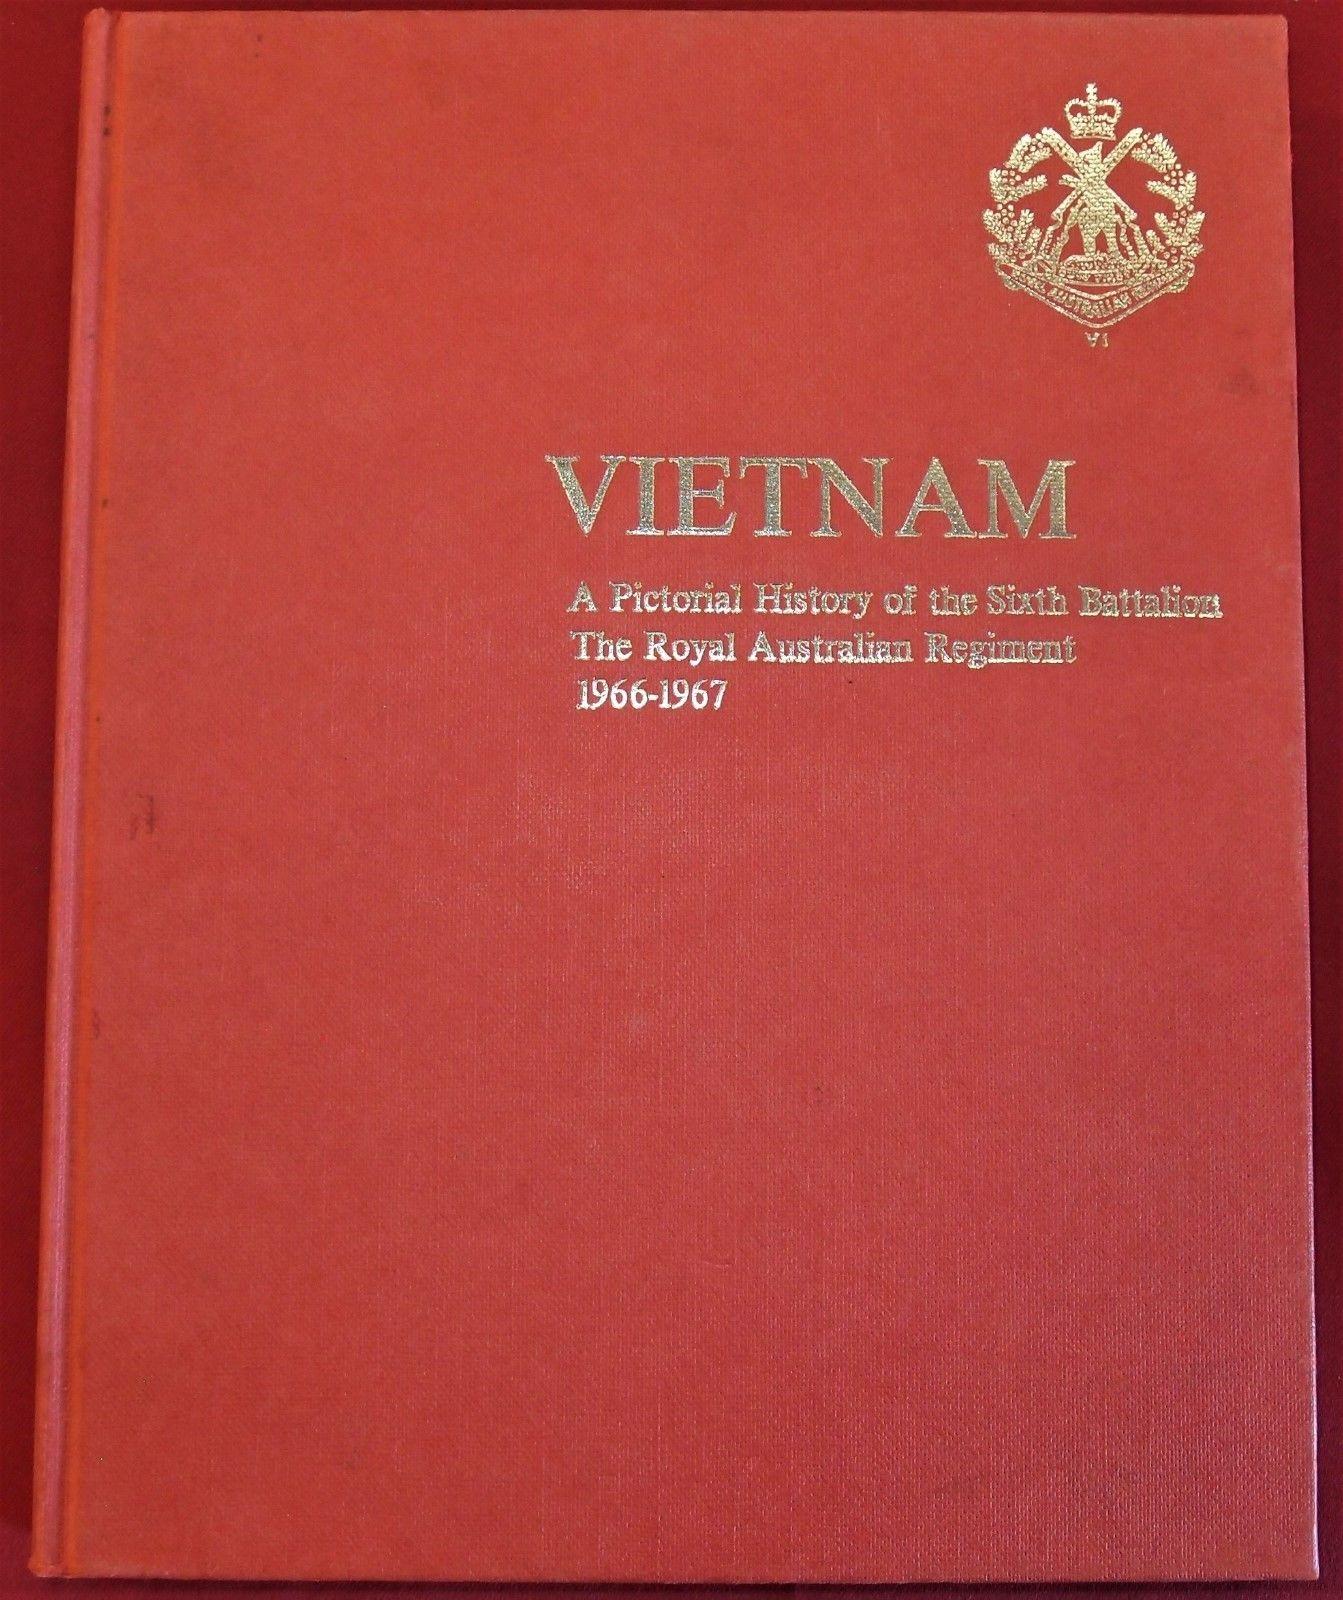 VIETNAM WAR 6TH BN ROYAL AUSTRALIAN REGIMENT ARMY UNIT HISTORY 1966-67